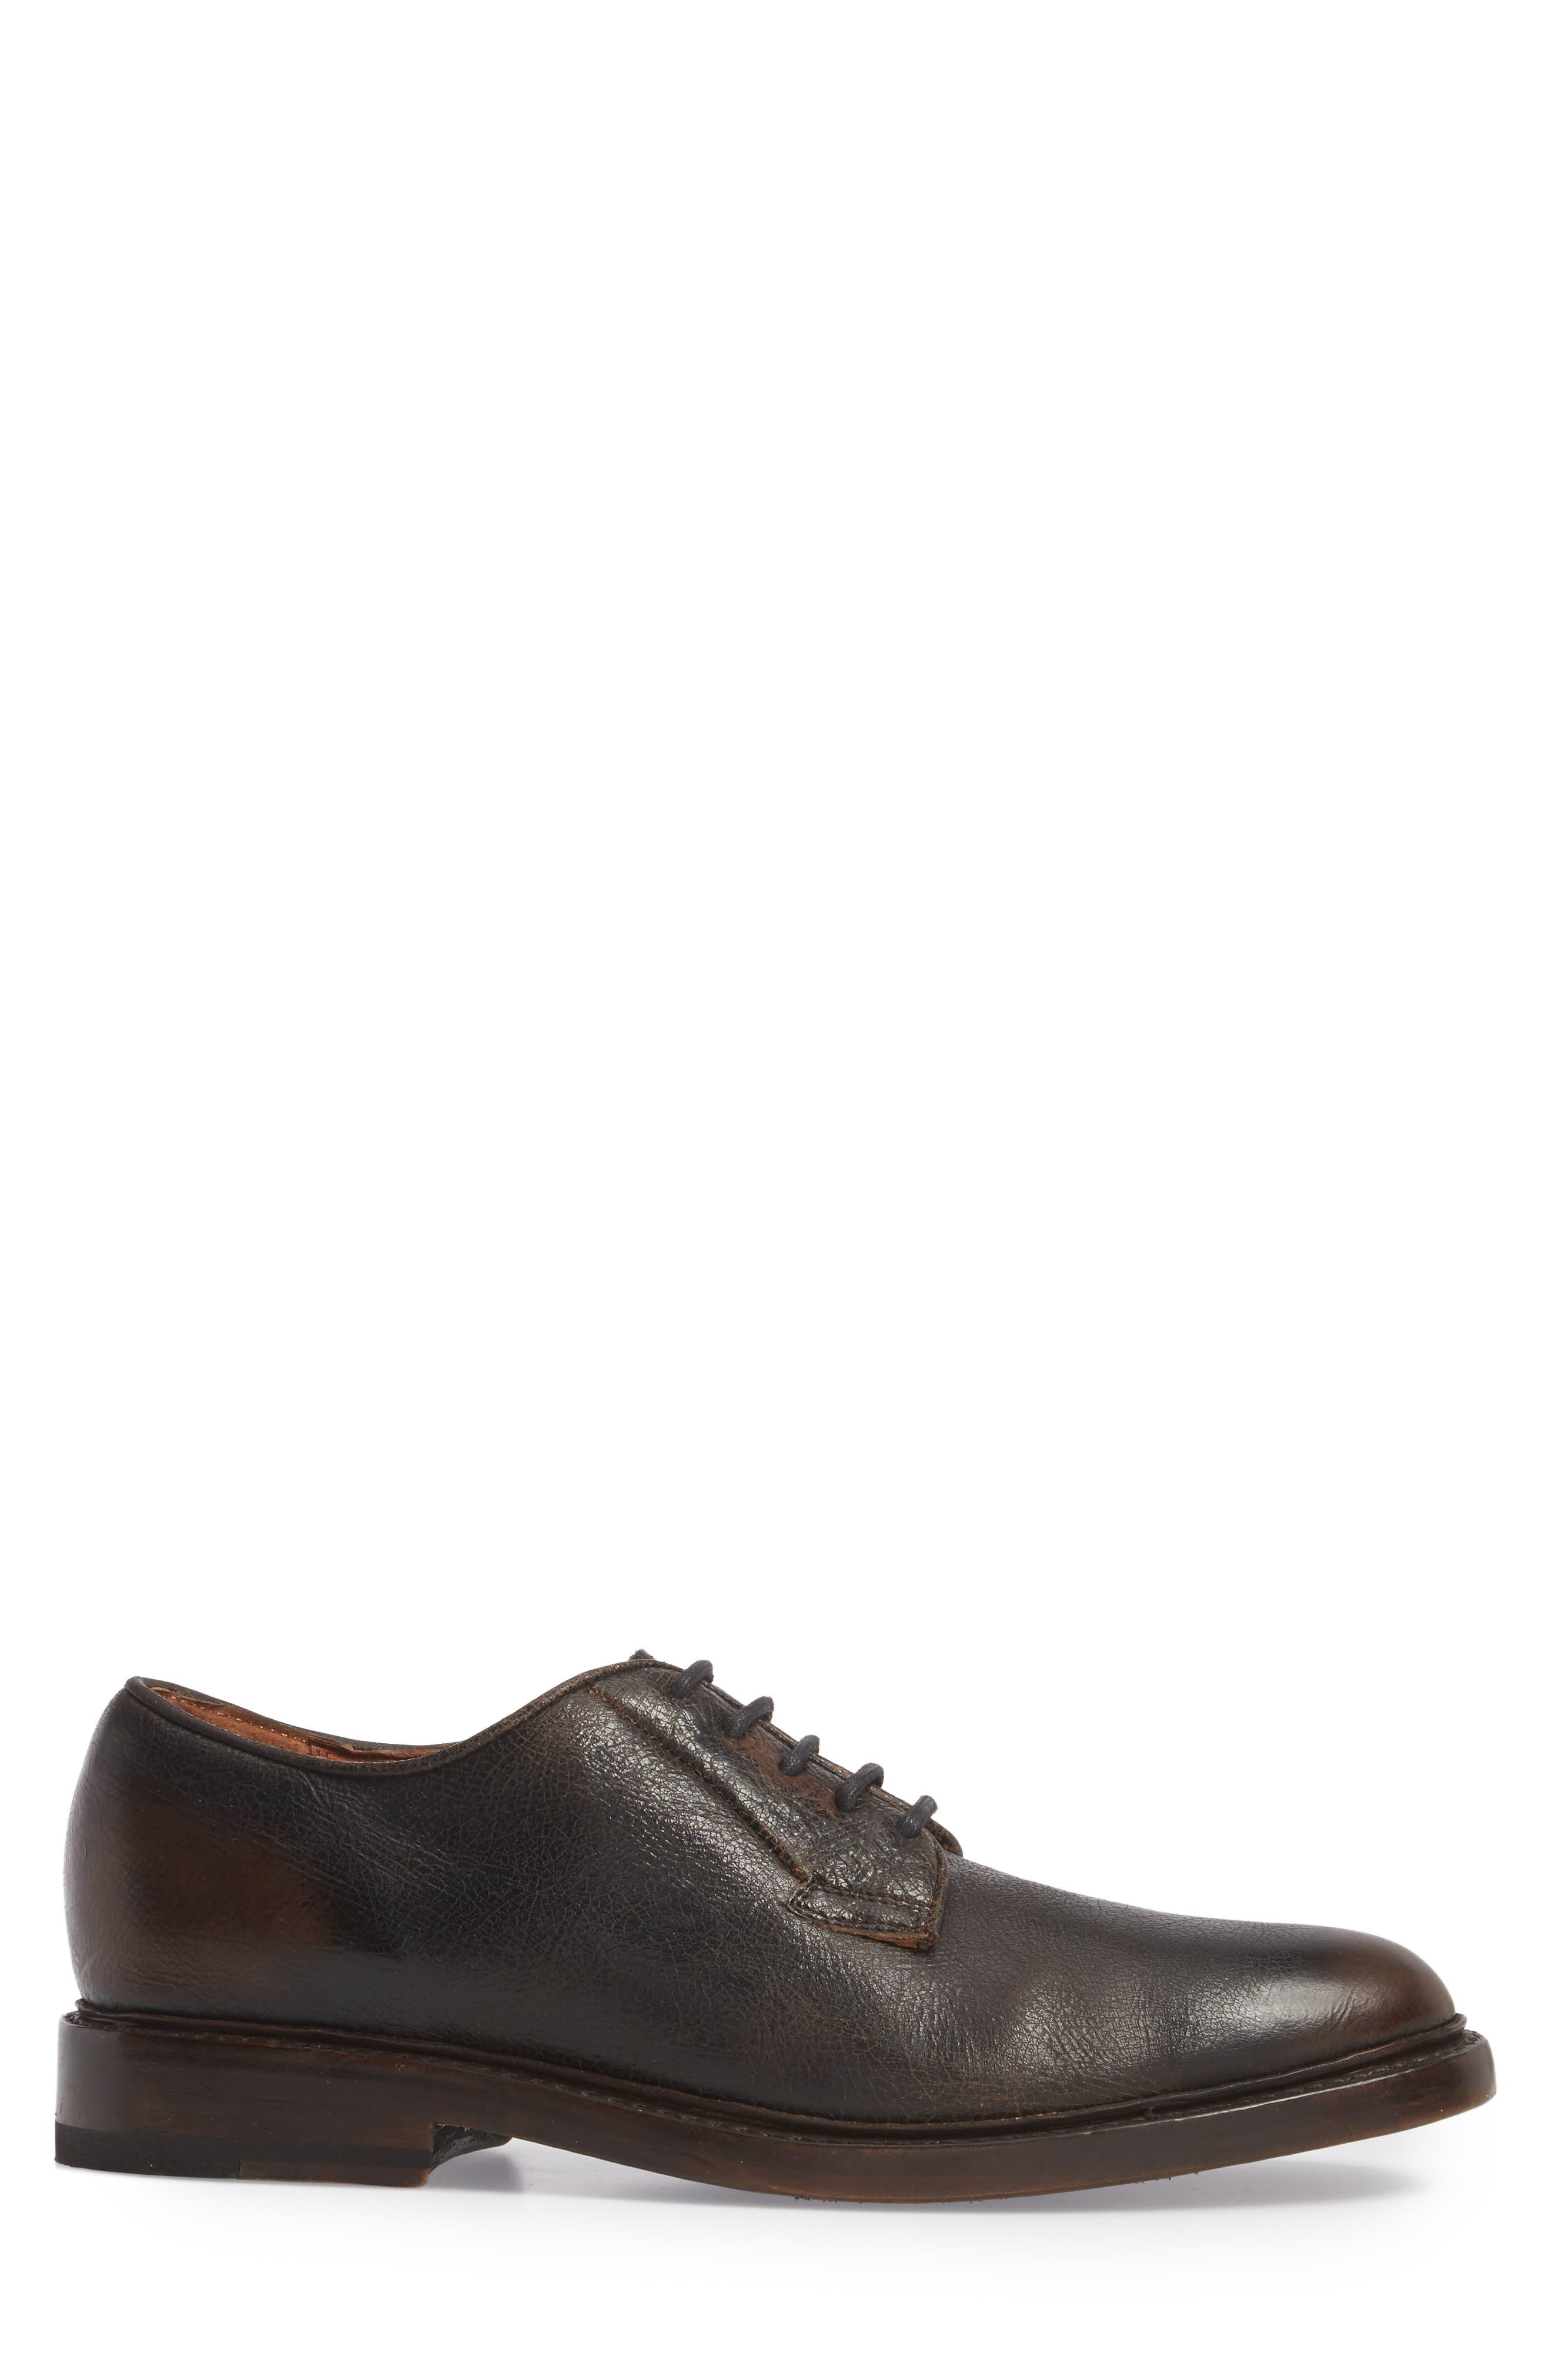 Jones Plain Toe Derby,                             Alternate thumbnail 3, color,                             Dark Brown Leather